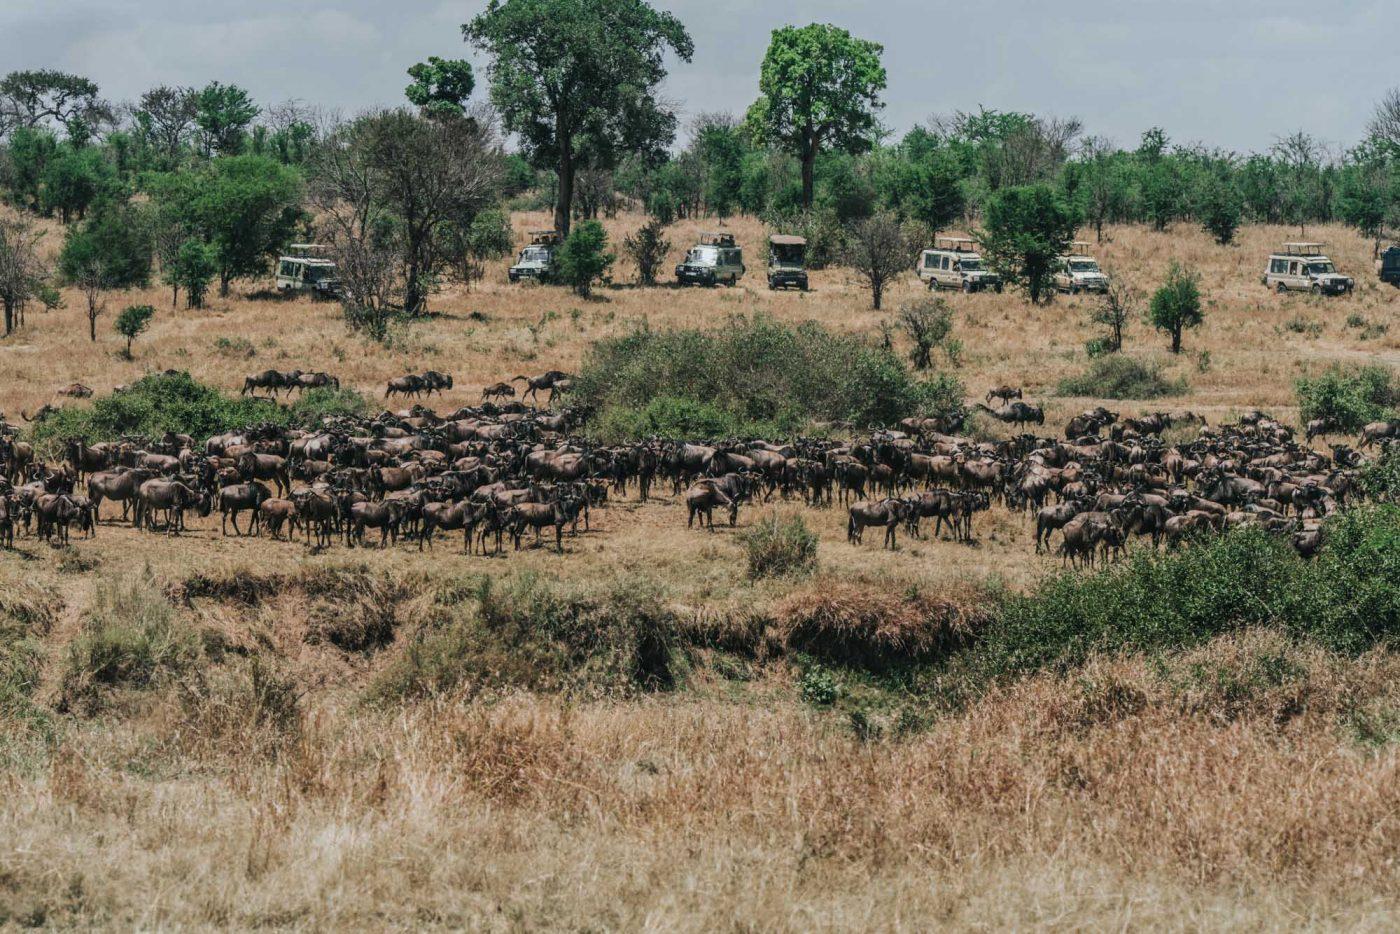 Serengeti Safari, wildebeest migration